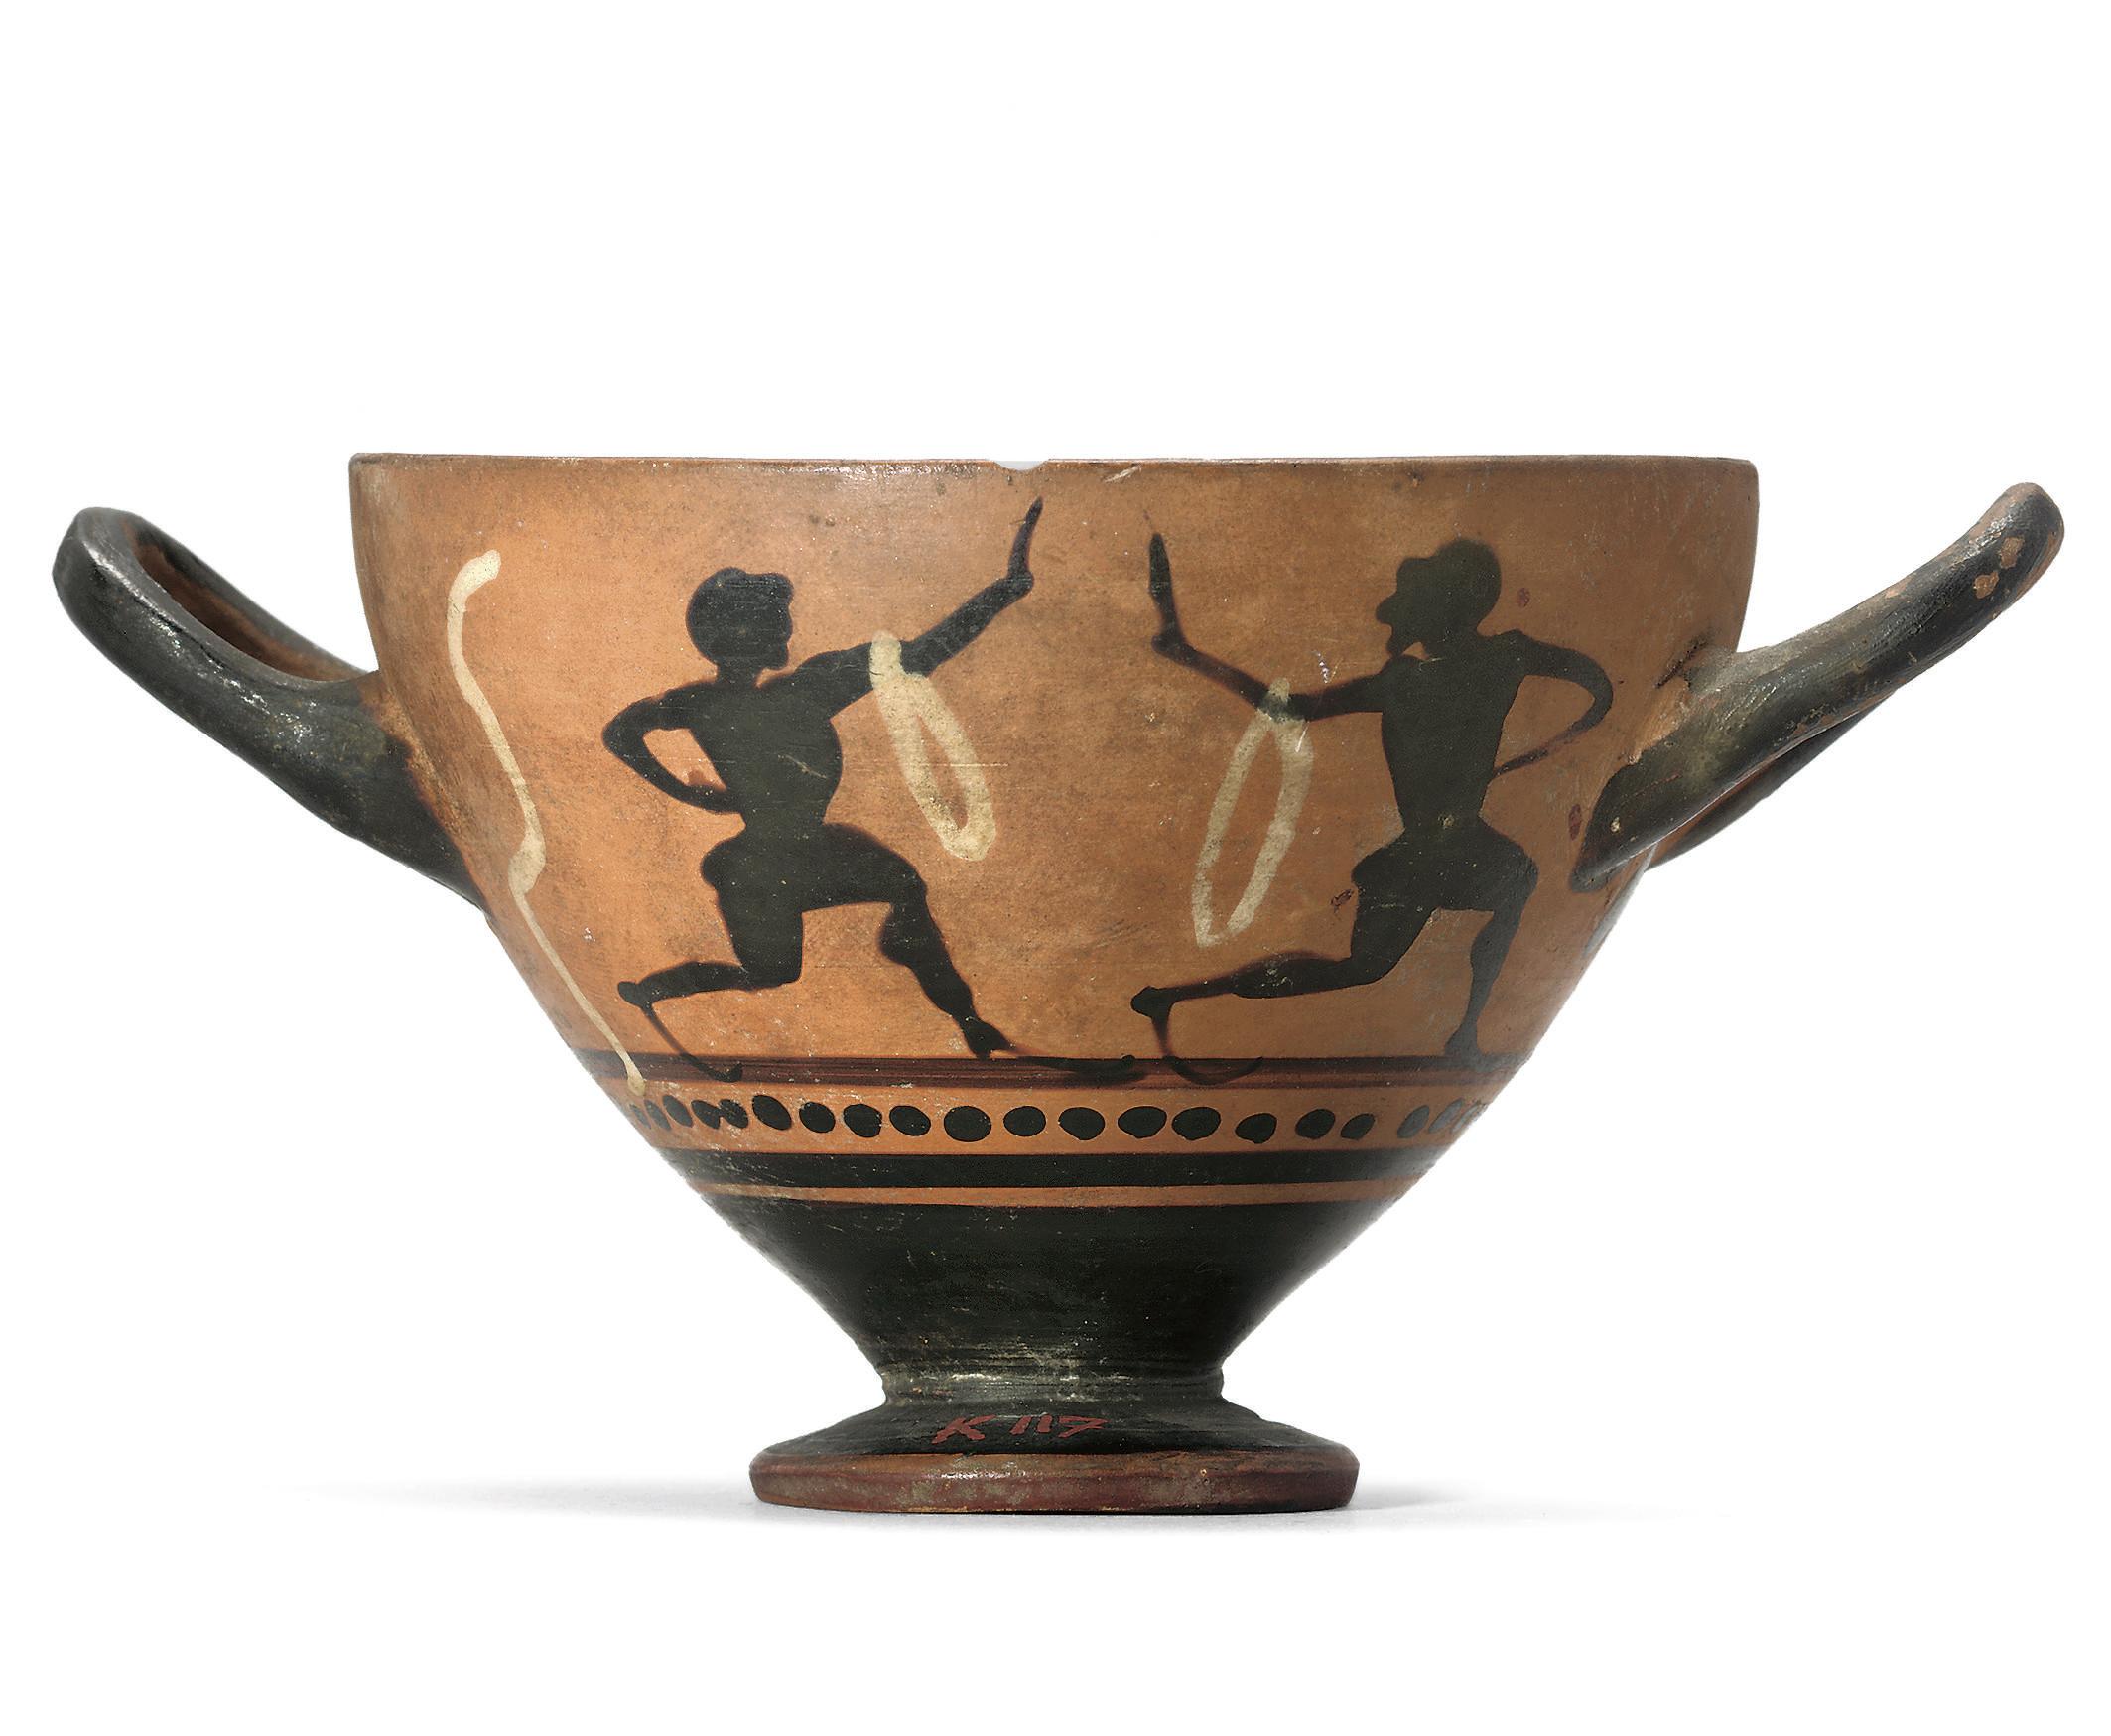 AN ATTIC MASTOID CUP, BELONGIN